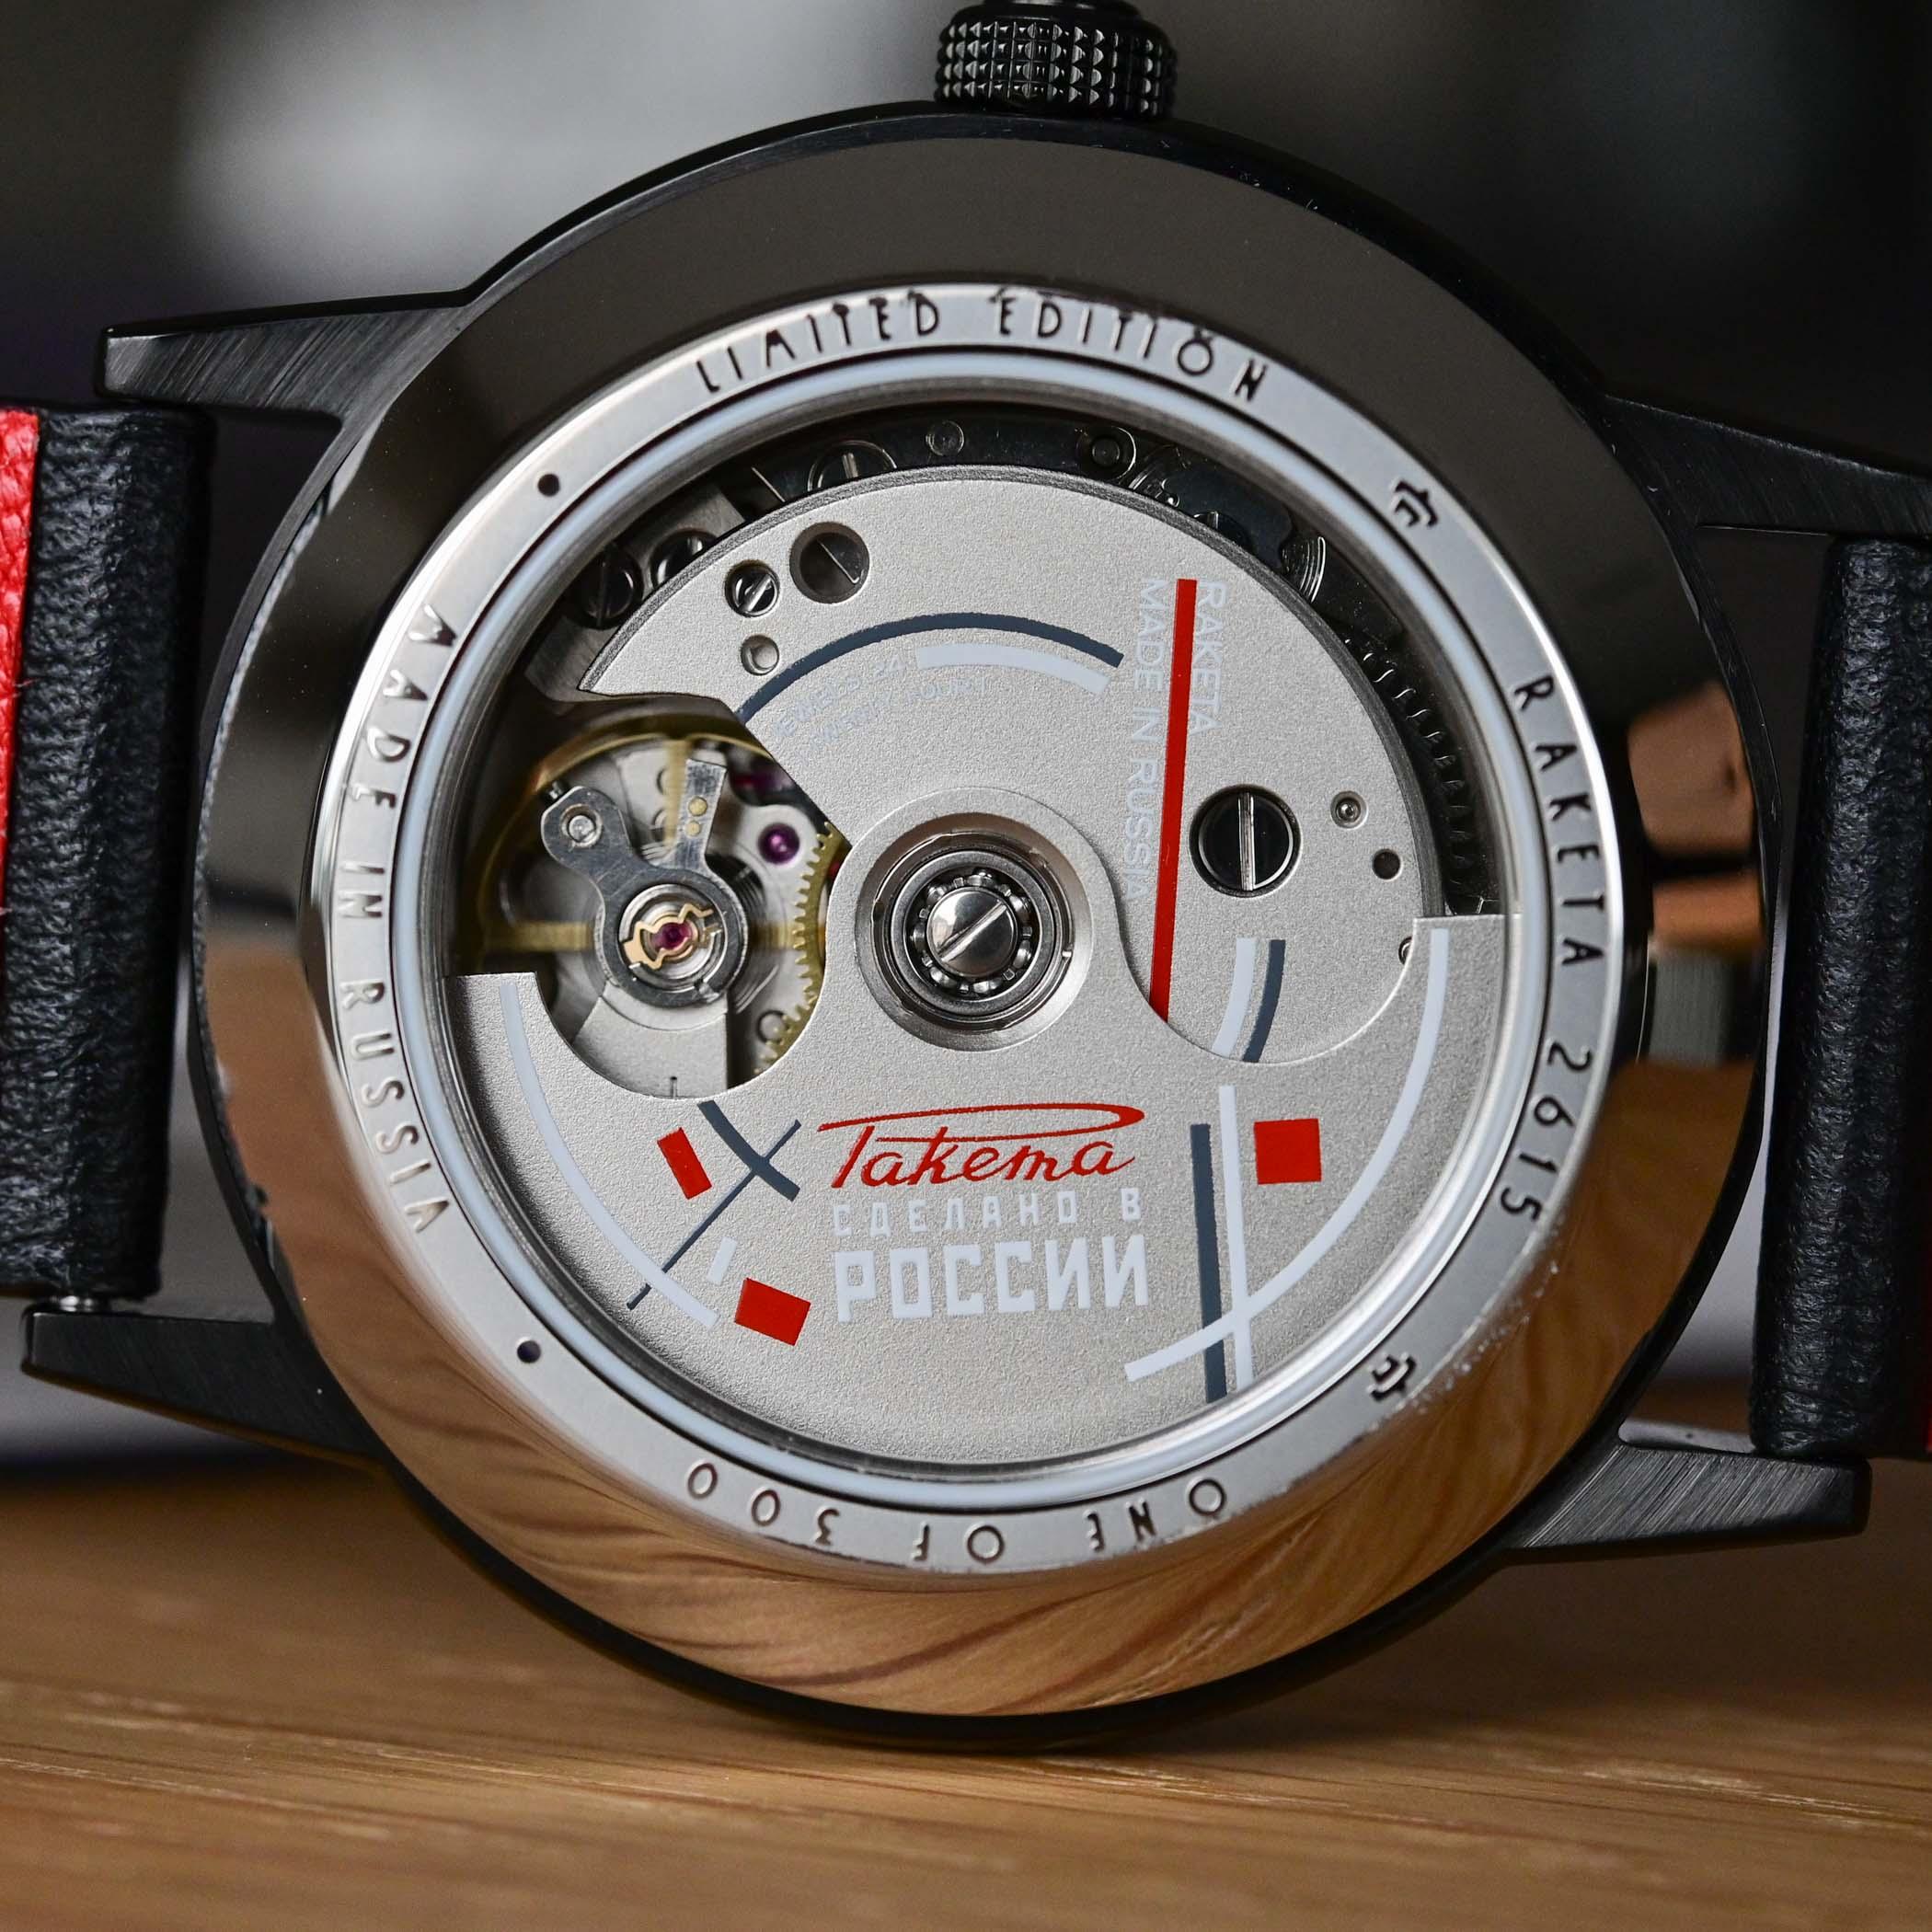 Raketa Avant-Garde Limited Edition 0279 - Art in Motion - review - 4